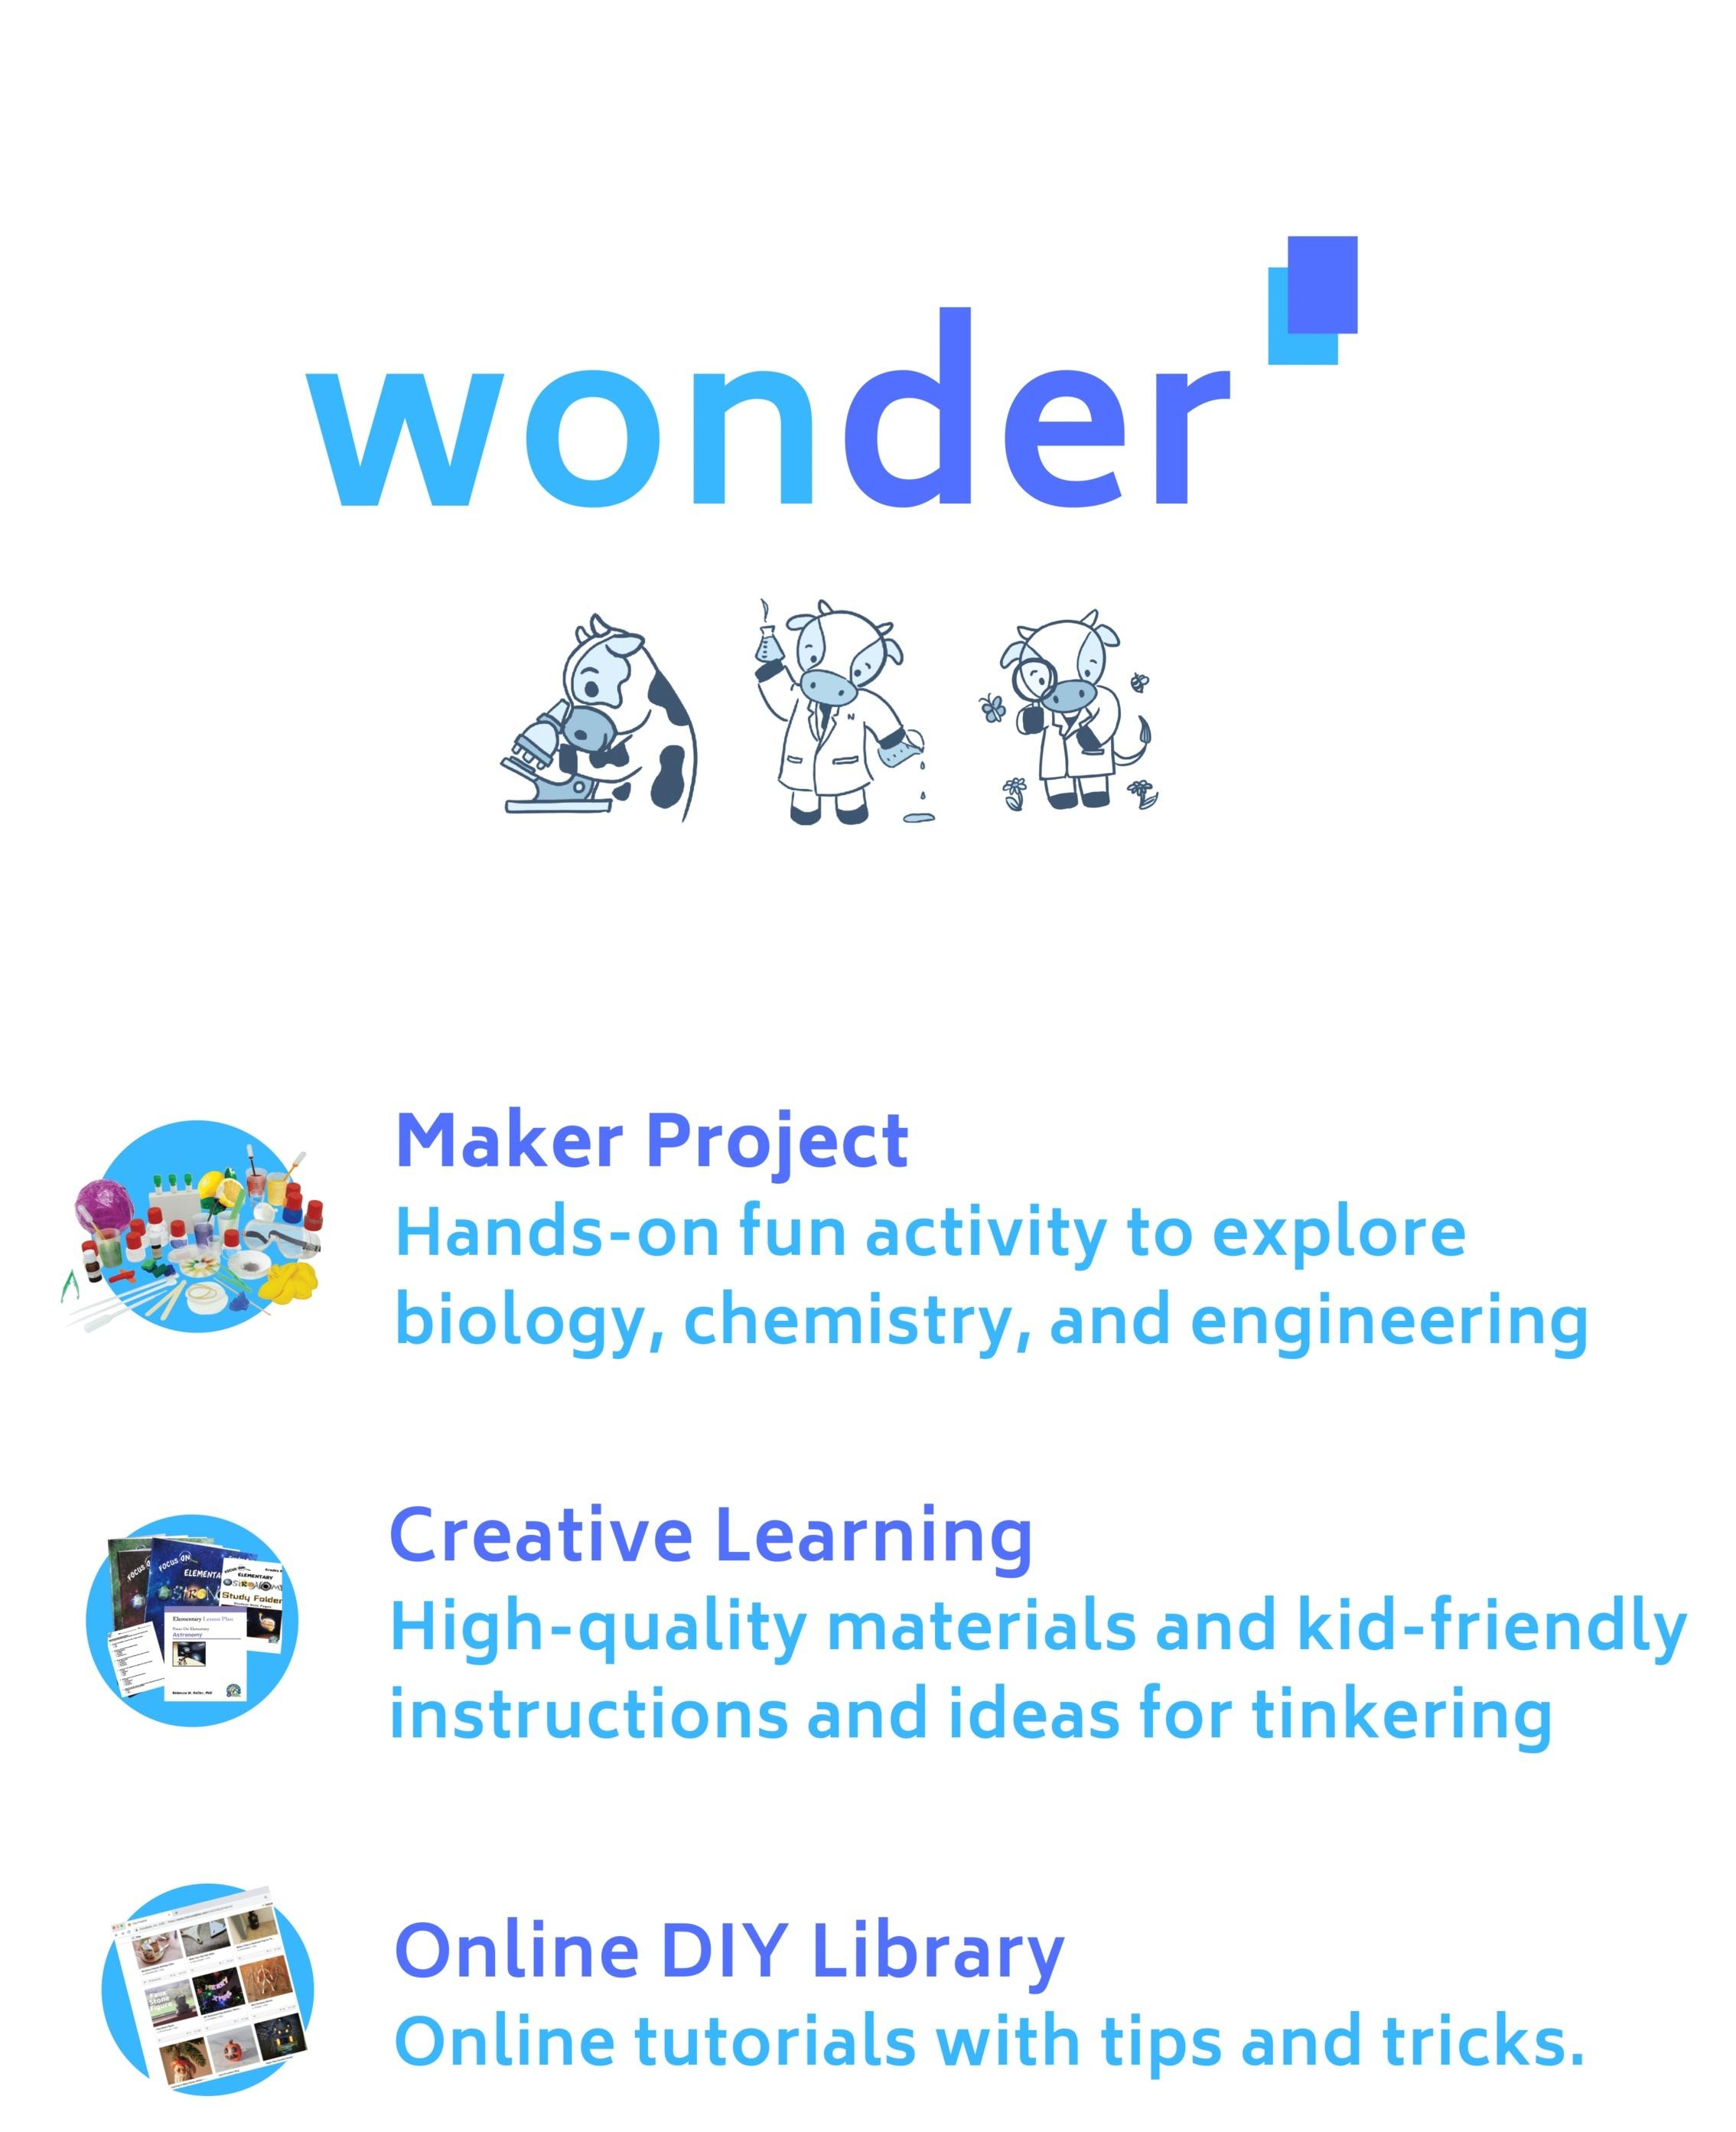 wonder-1.png